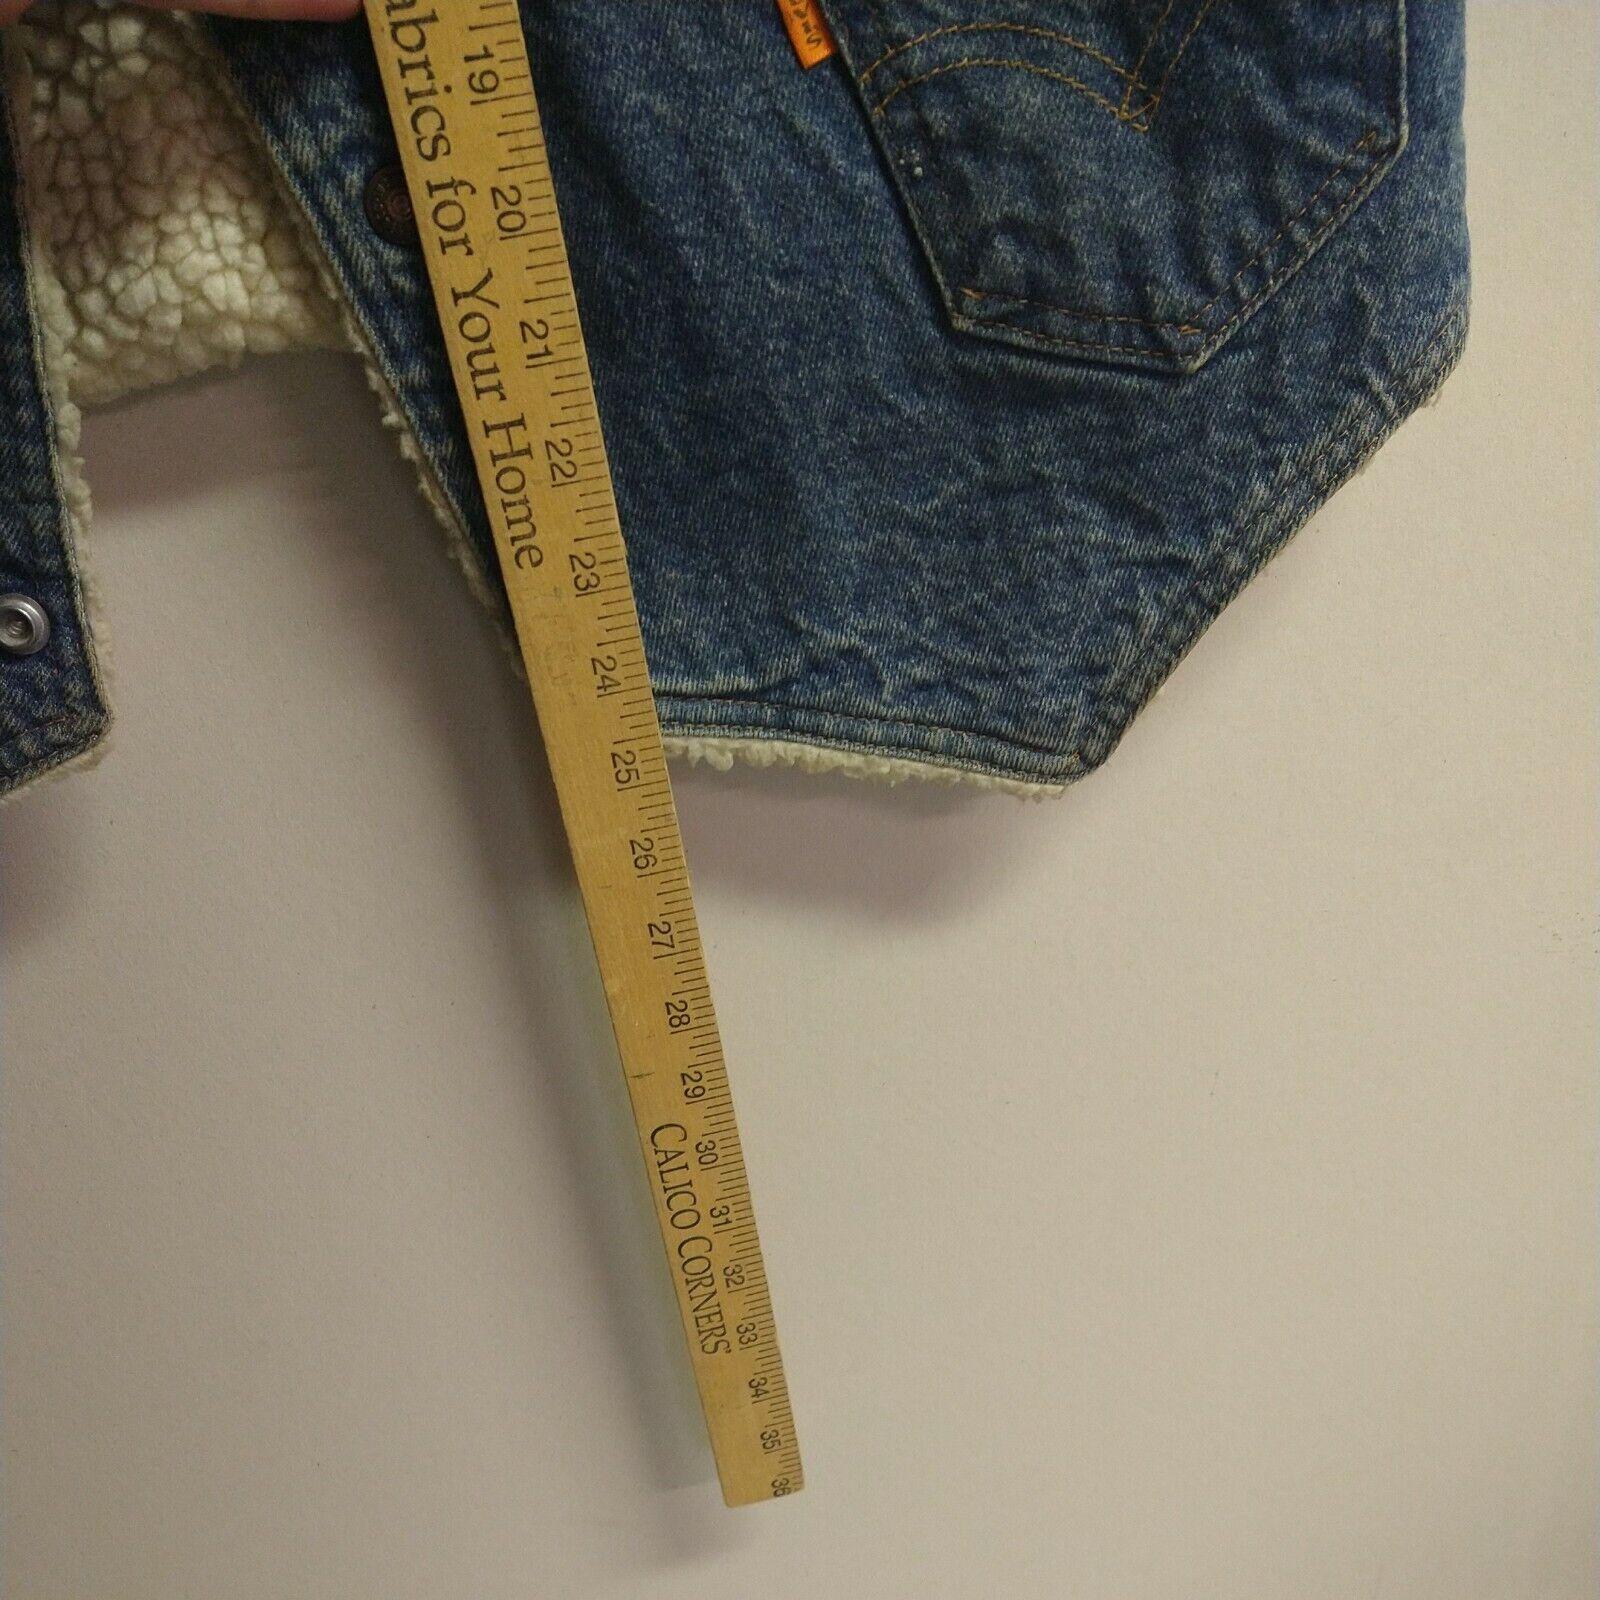 Levis vintage clothing Vest made in USA - image 7